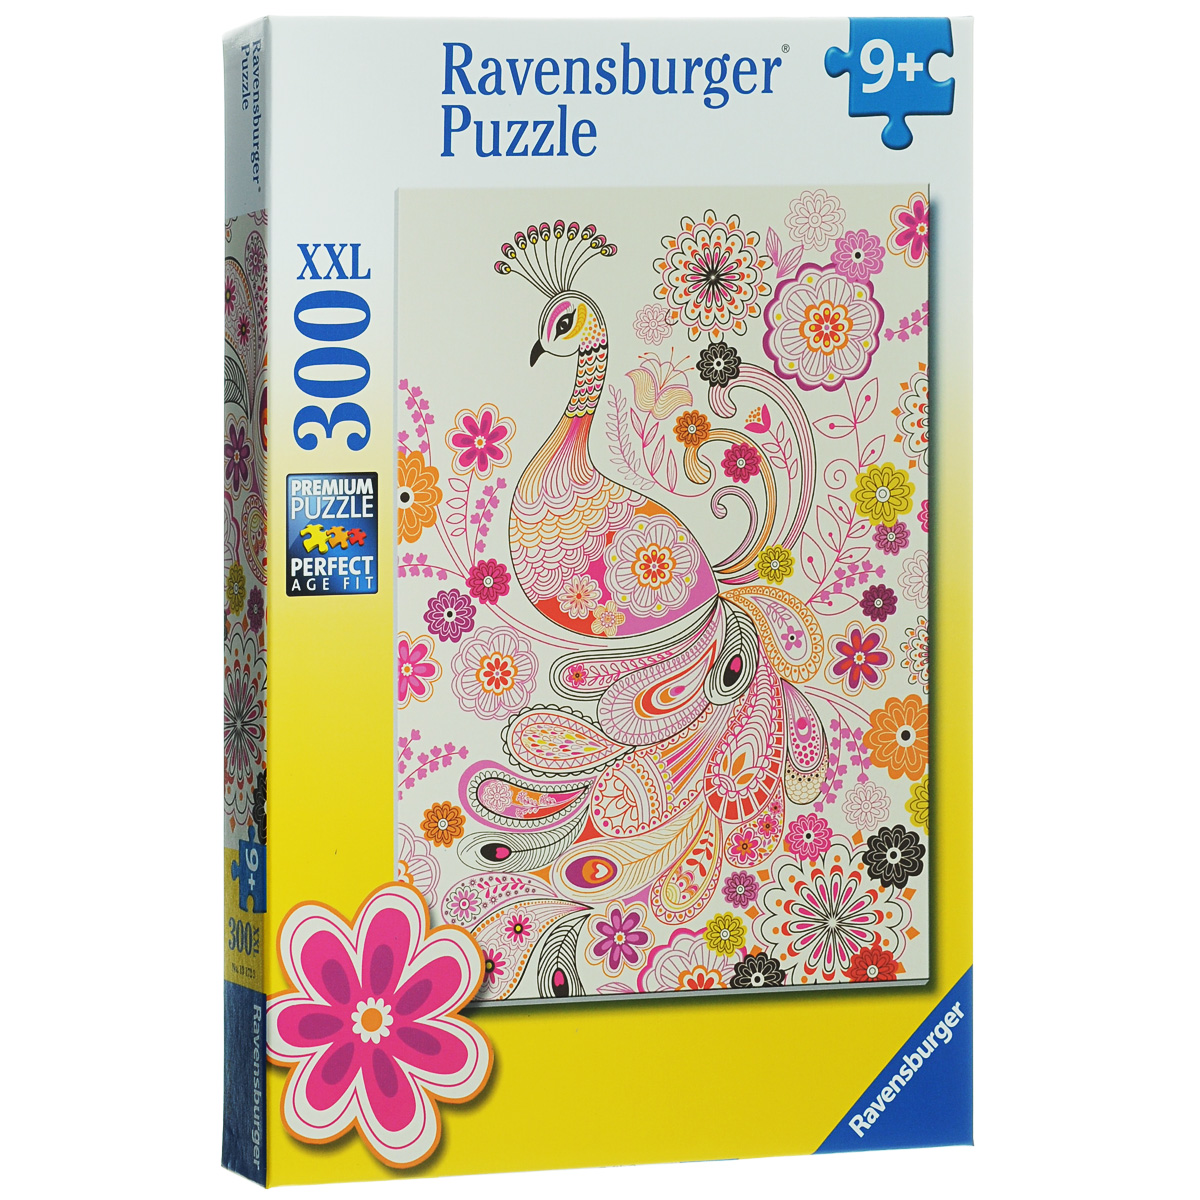 Ravensburger Жар-птица. Пазл XXL, 300 элементов